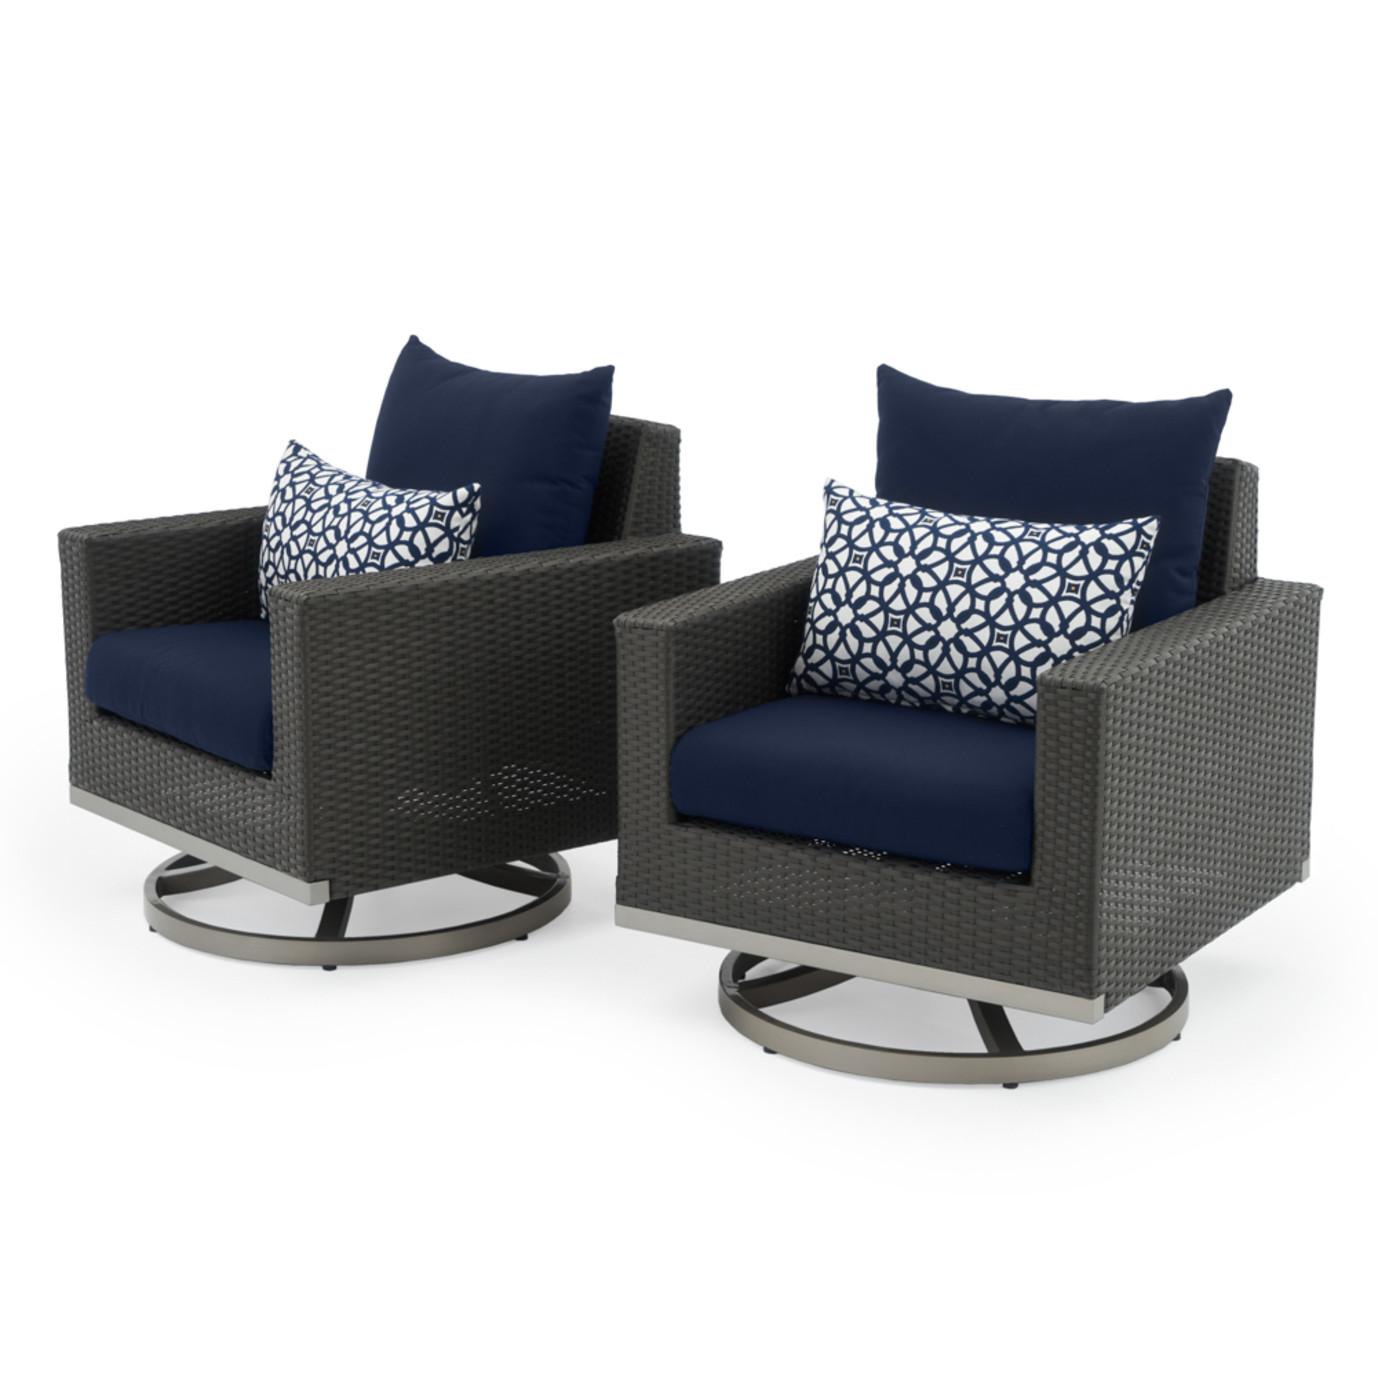 Milo™ Espresso Motion Club Chairs - Navy Blue